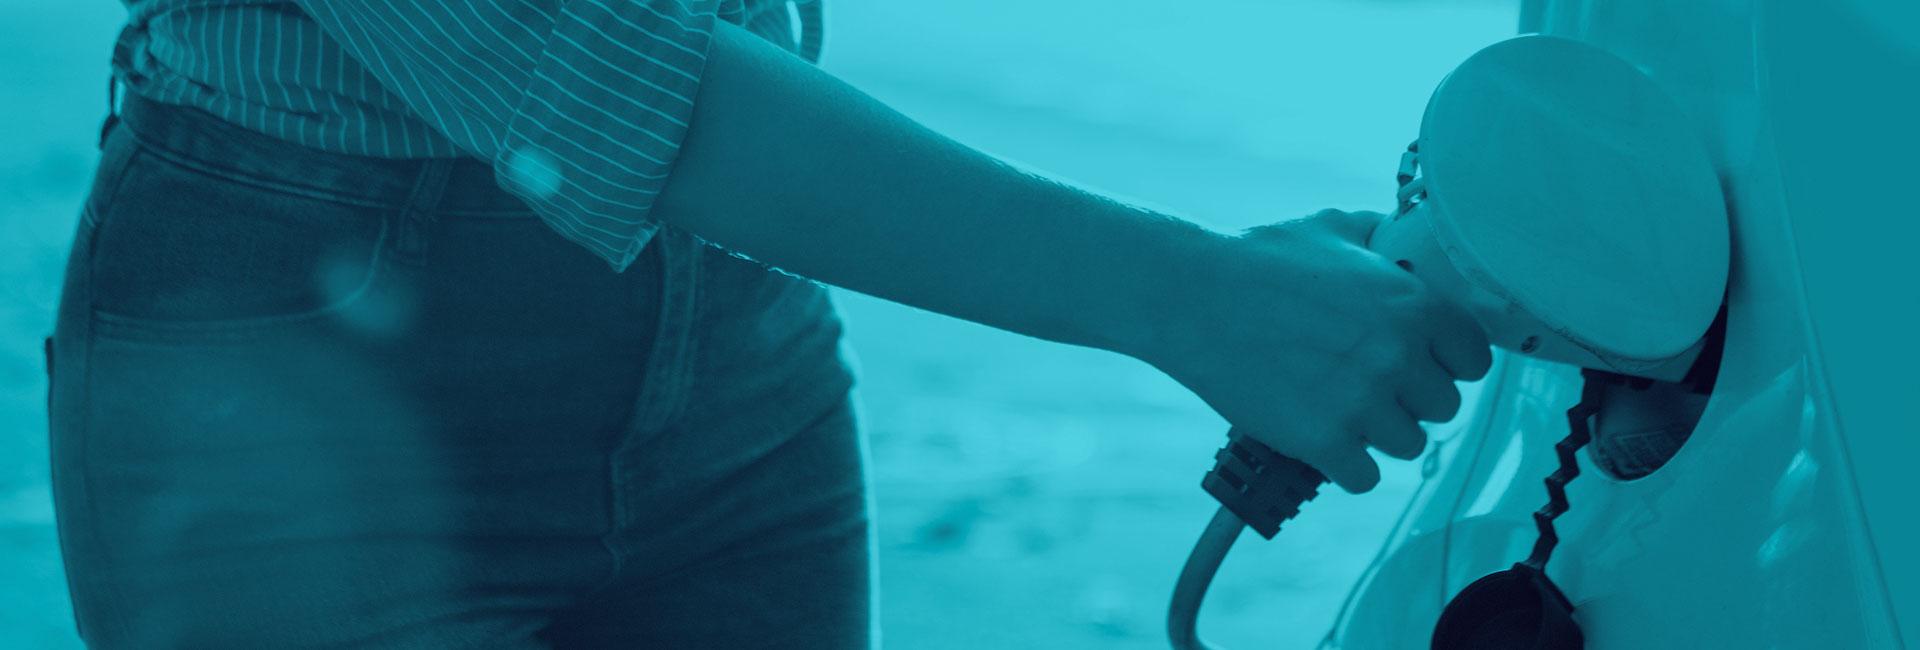 INBRANDING - Blog - Instituciones como partners de marca